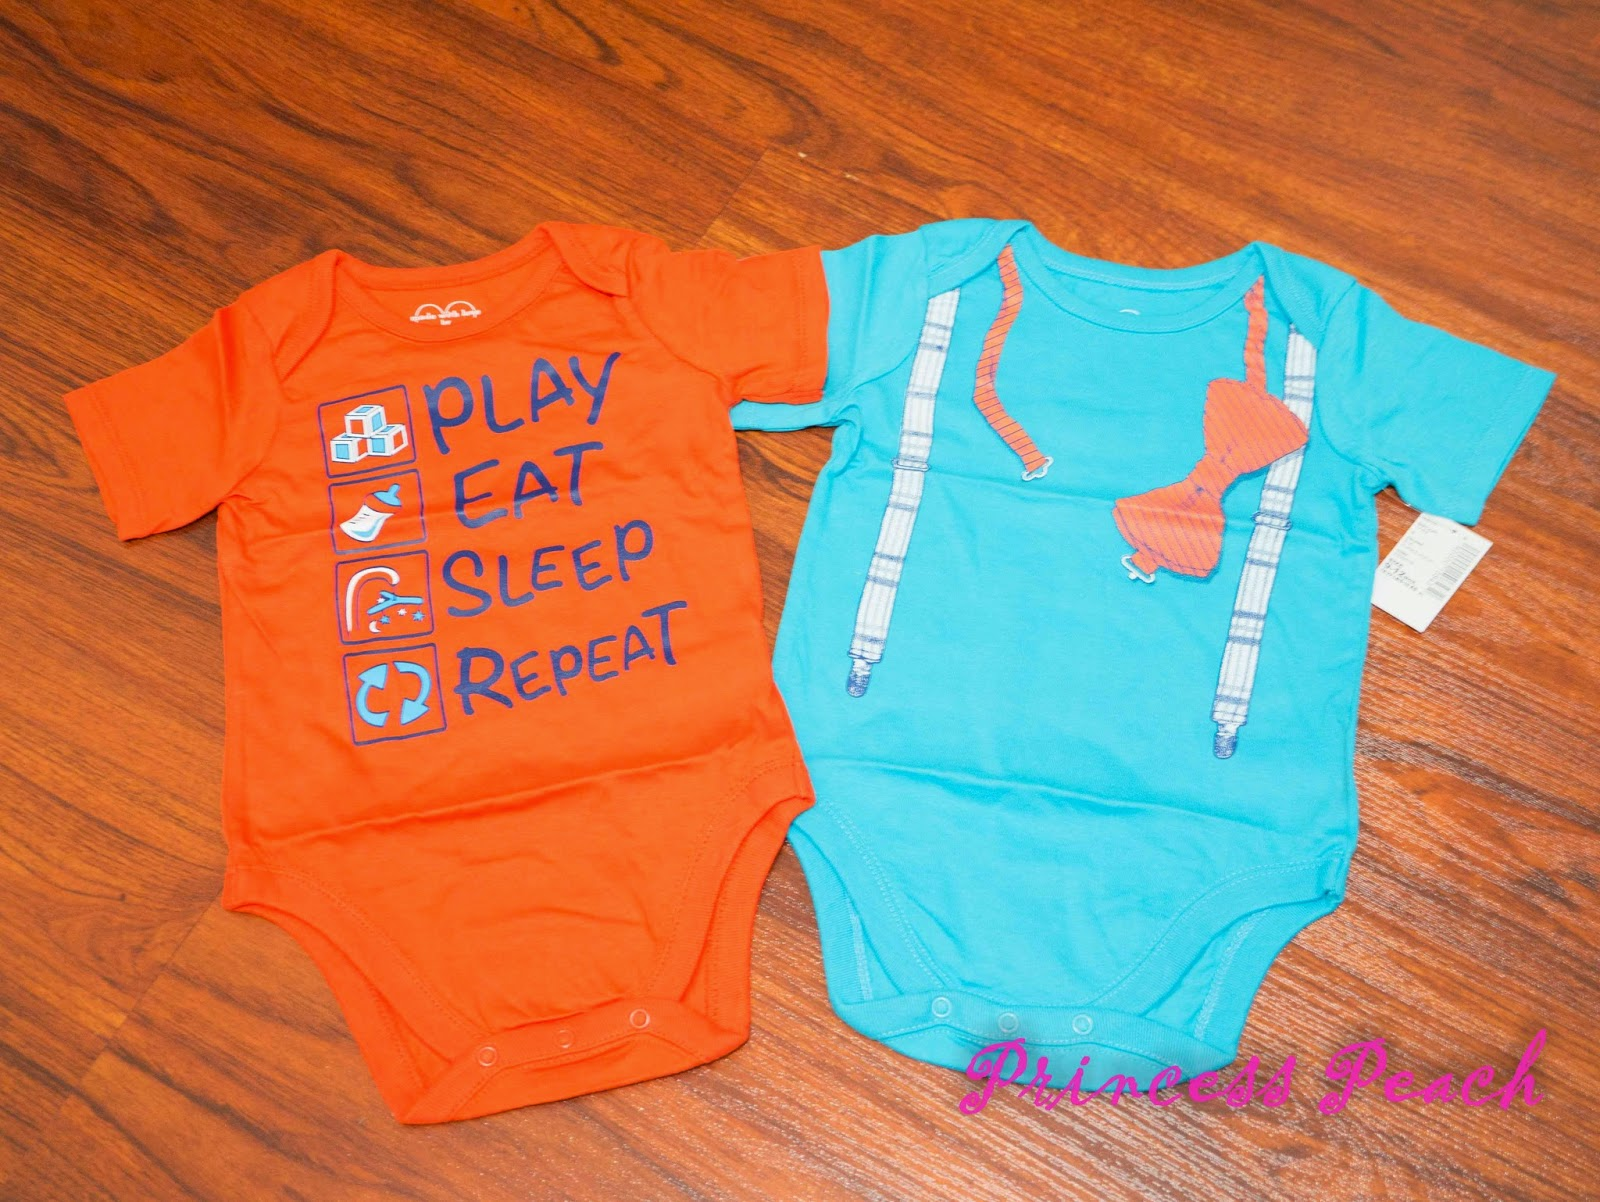 http://twpeach.blogspot.com/2015/05/us-clothes.html